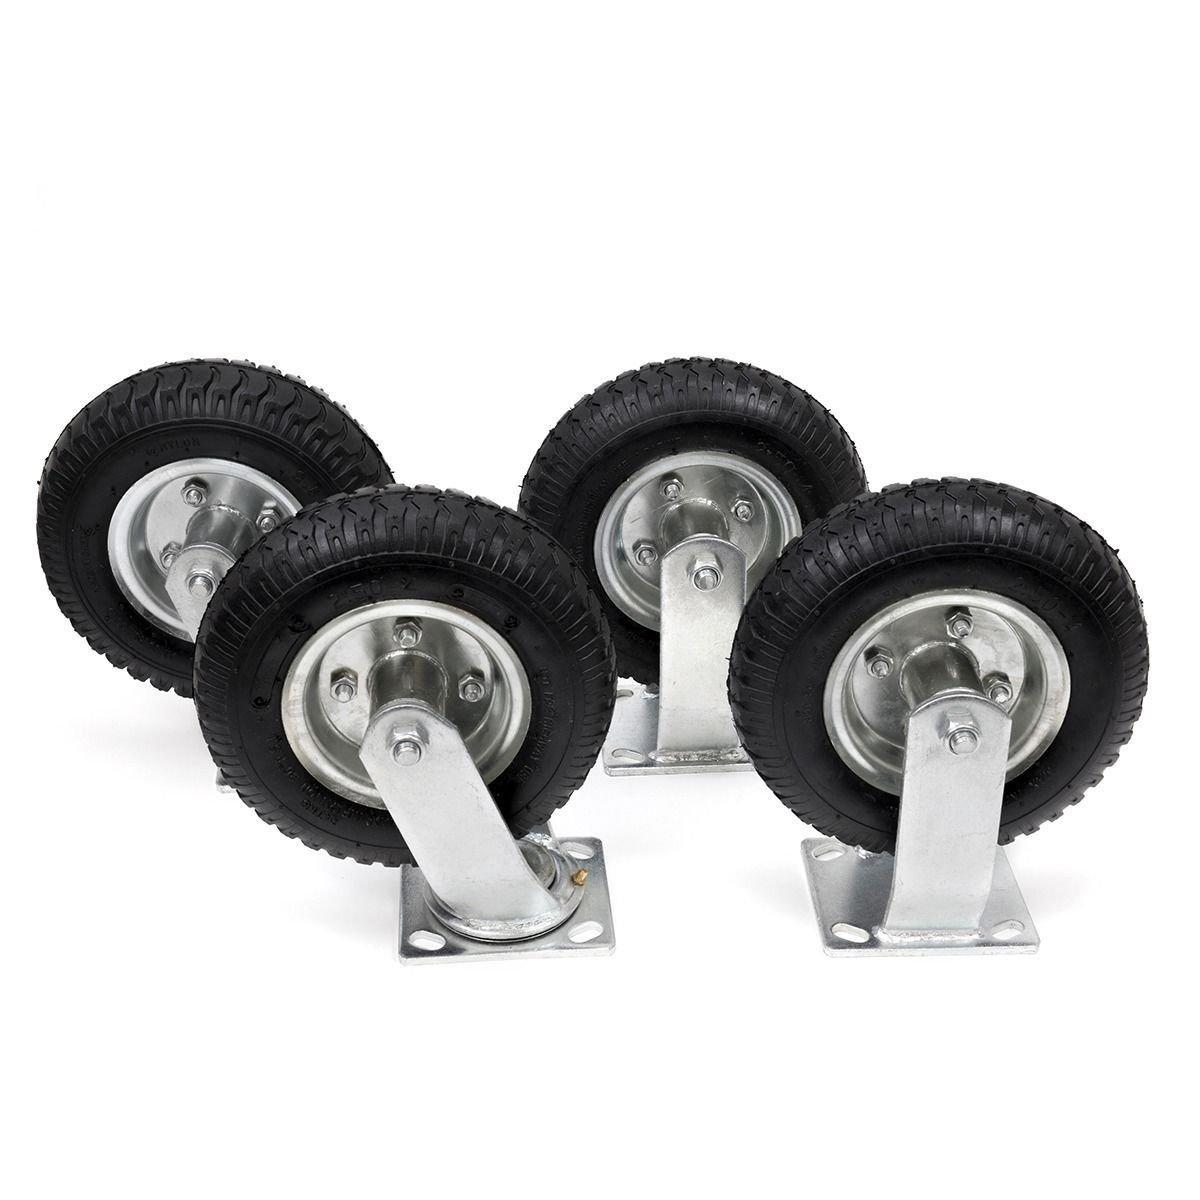 4Pcs 8'' Pneumatic Air Tire Wheel 2 Rigid + 2 Swivel HD Farm Cart Caster Large